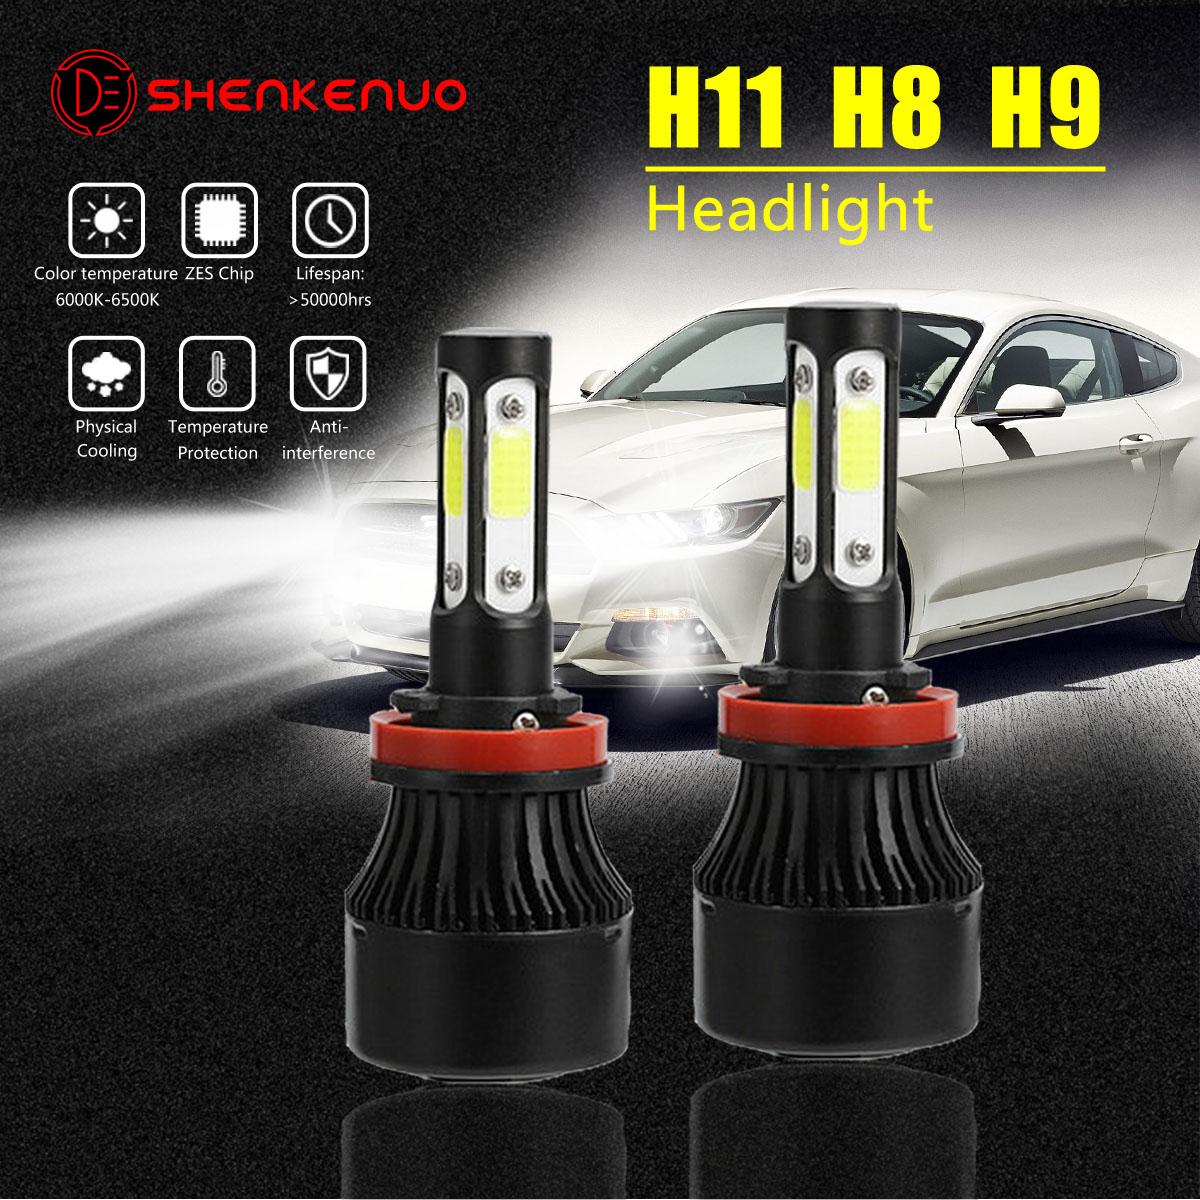 H11 Fog Lights For Mustang 2005-2012 4sides Dual Hi//Lo Beam H13 LED Headlight